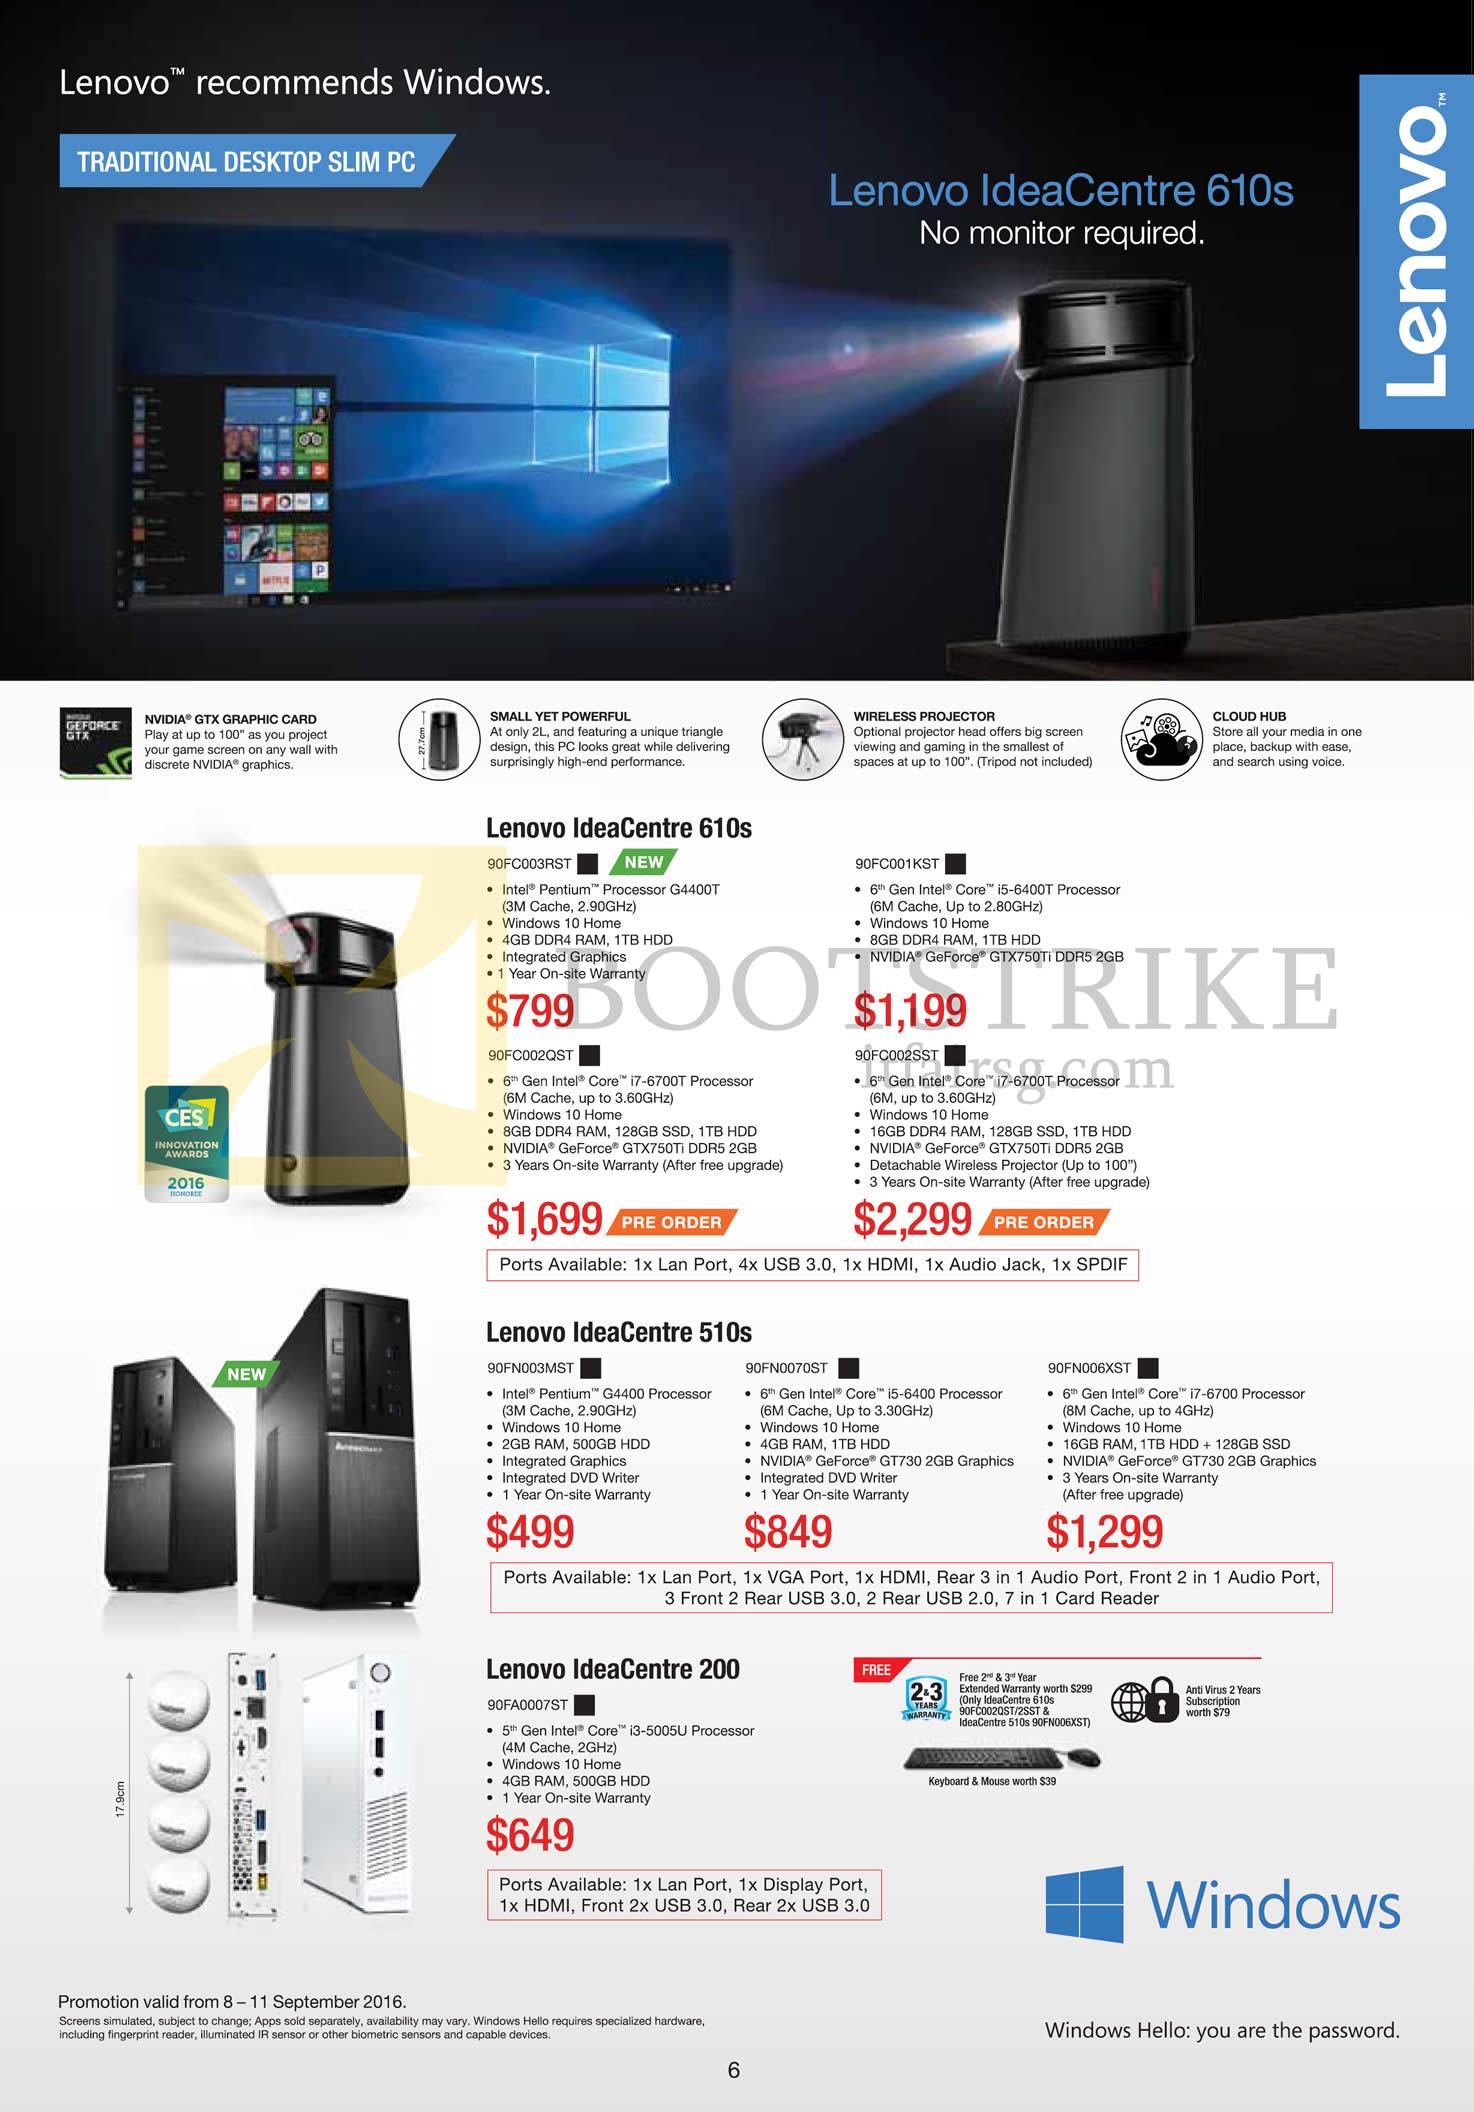 COMEX 2016 price list image brochure of Lenovo Desktop PC IdeaCentre 610s, 510s, 200